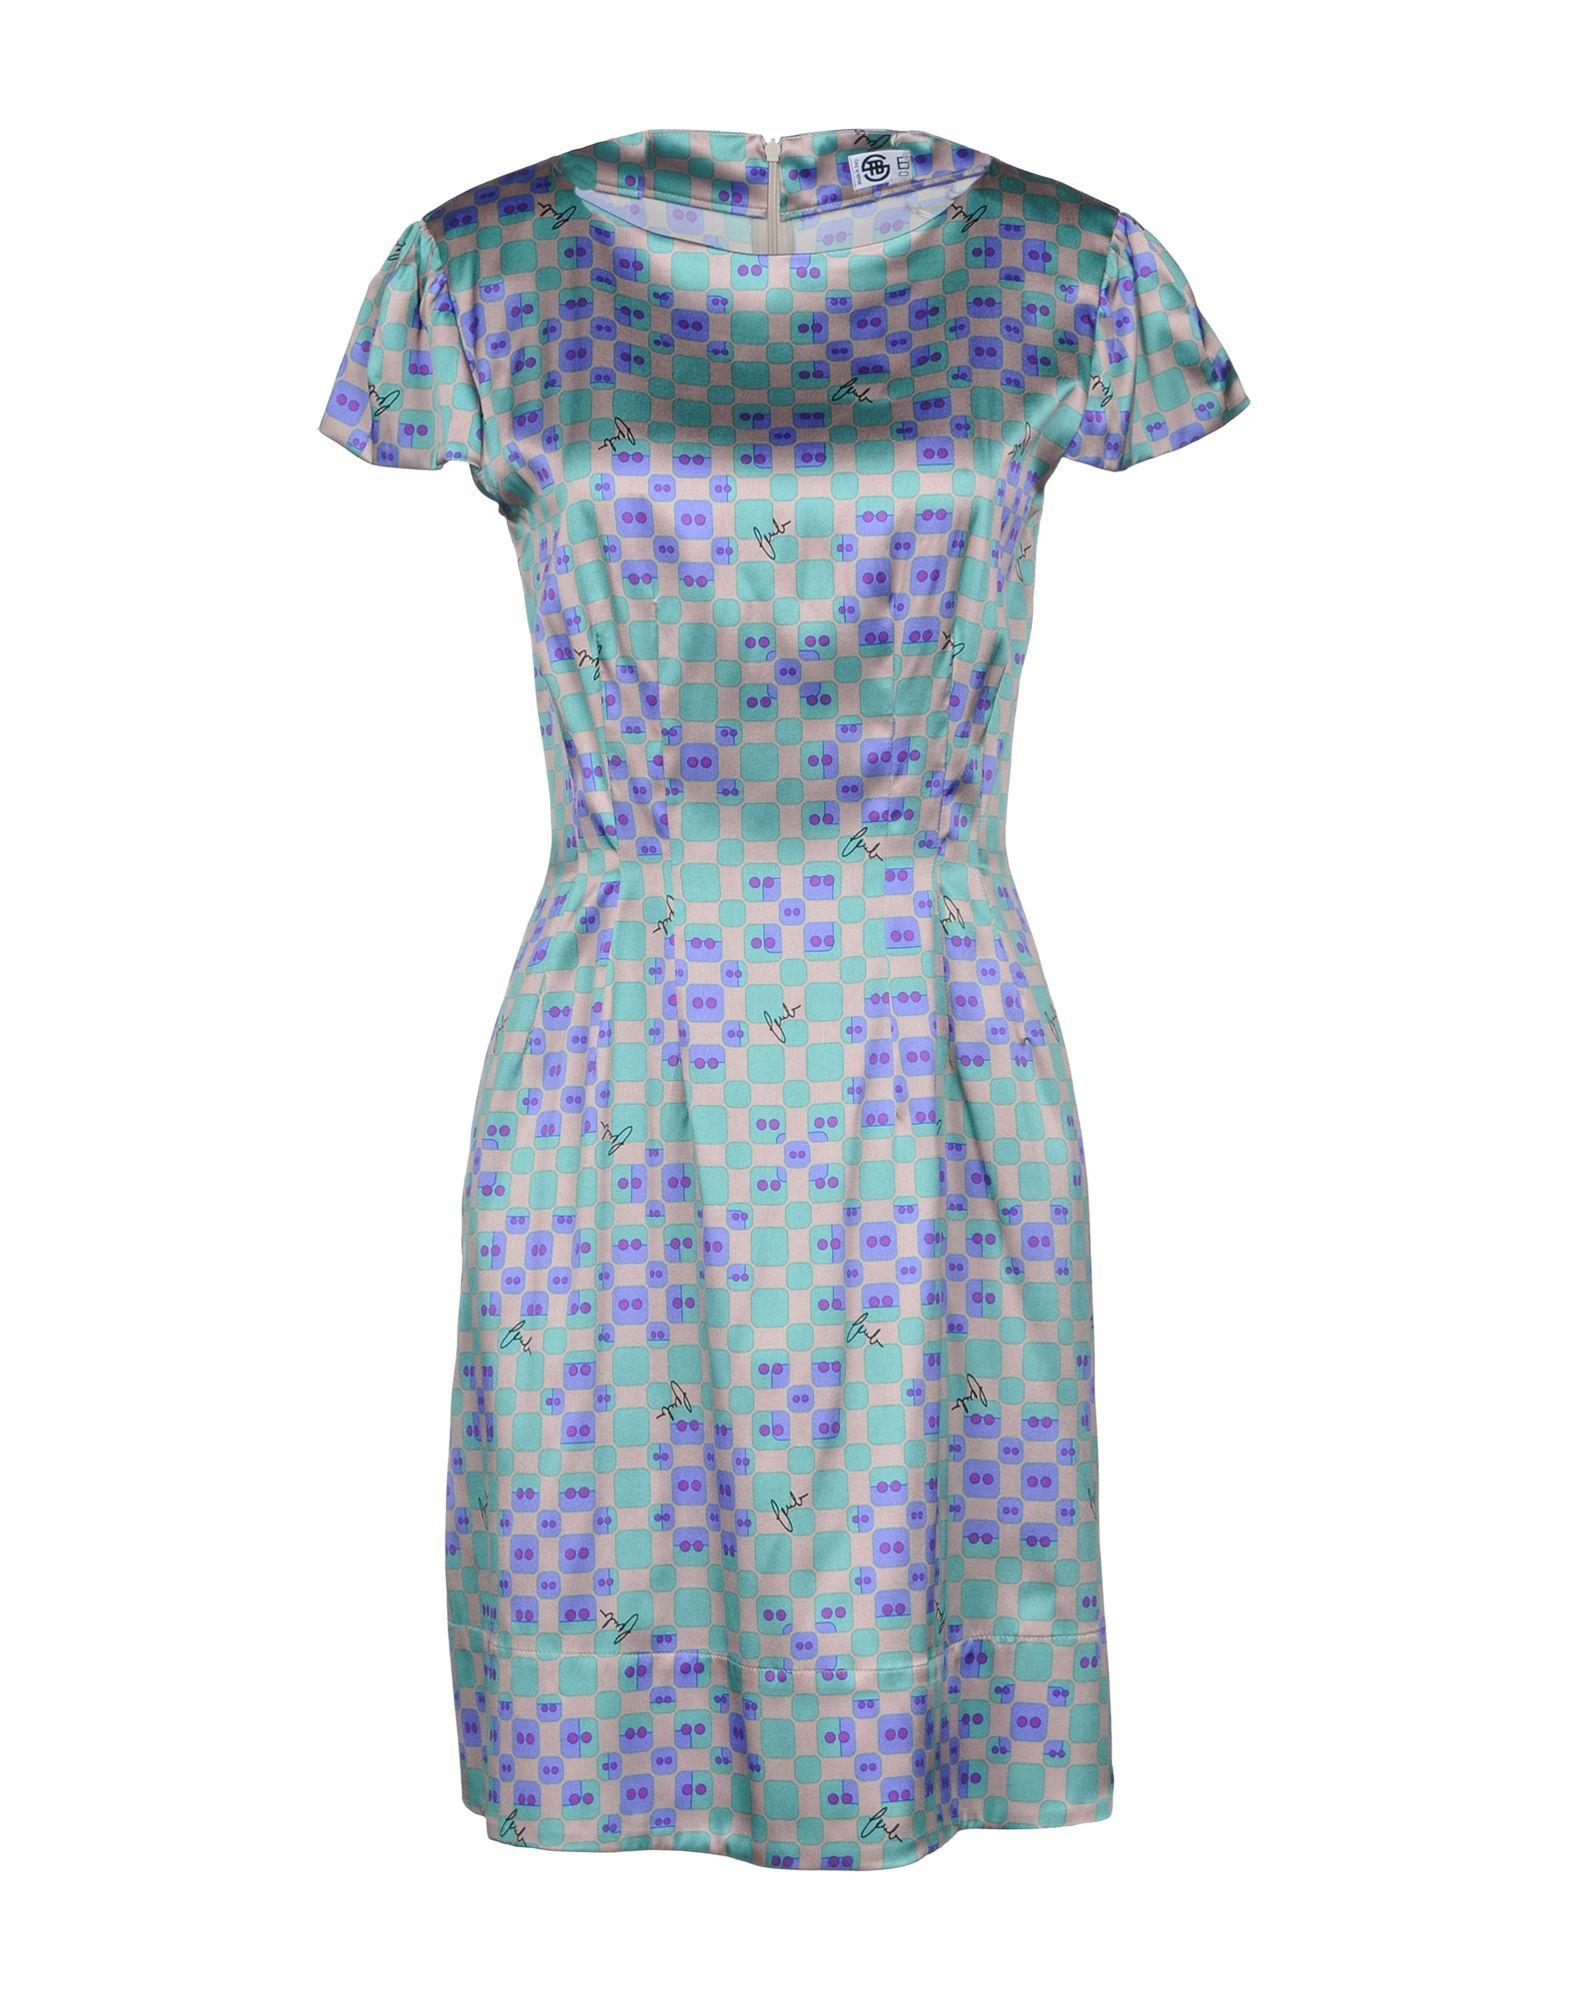 decd6948a28 Bini Como Short Dress - Women Bini Como Short Dresses online on YOOX ...